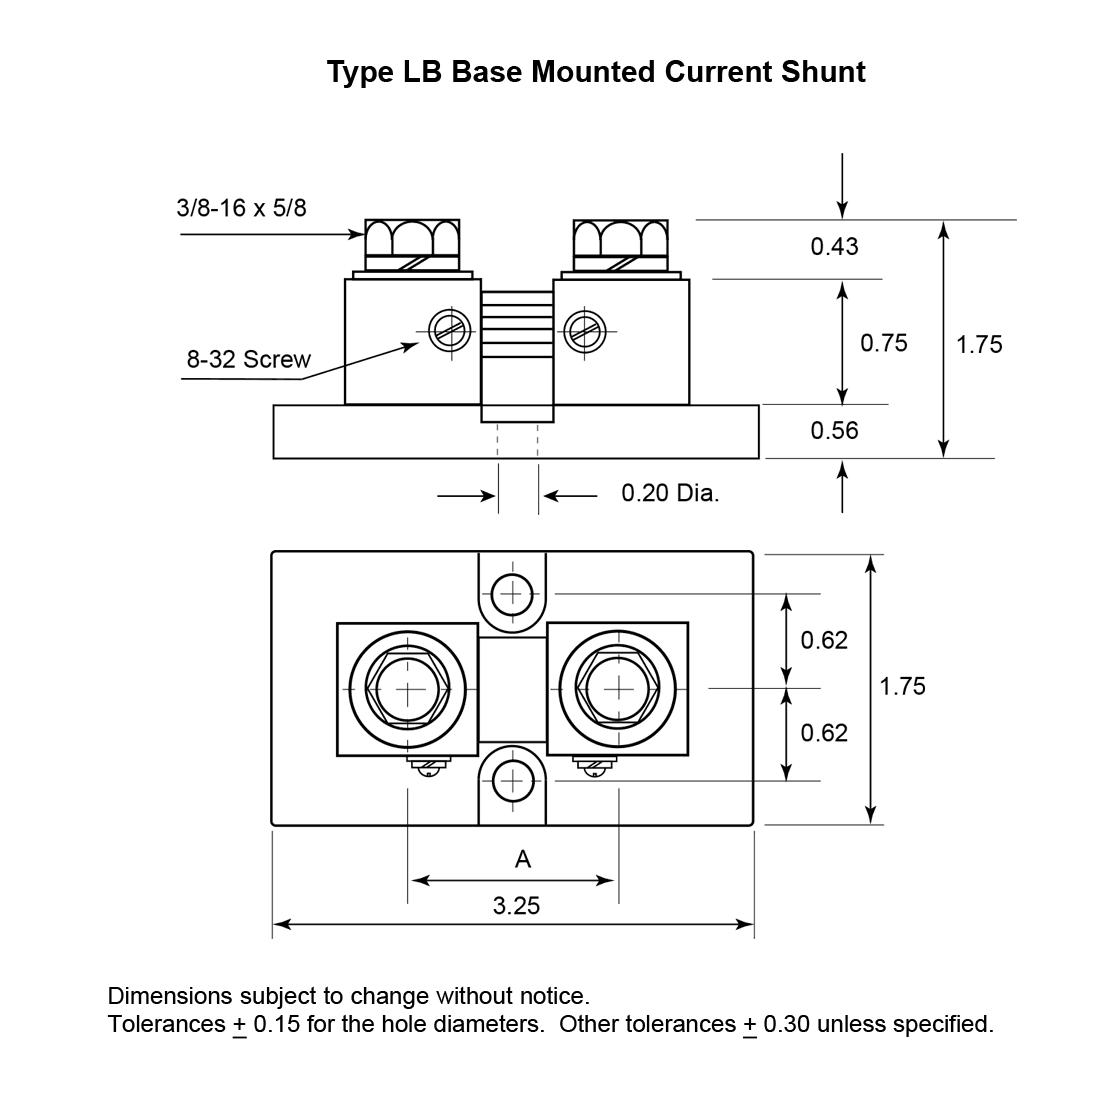 Dimensional Drawing: Type LB